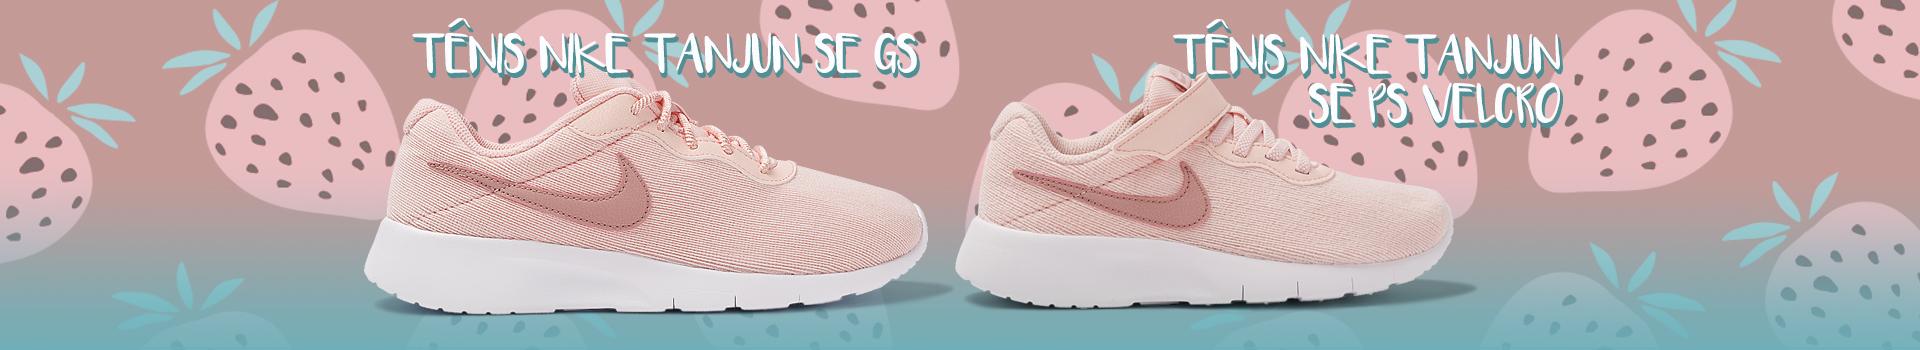 tvdesk_p4-14_01_19-Nike_Tanjun